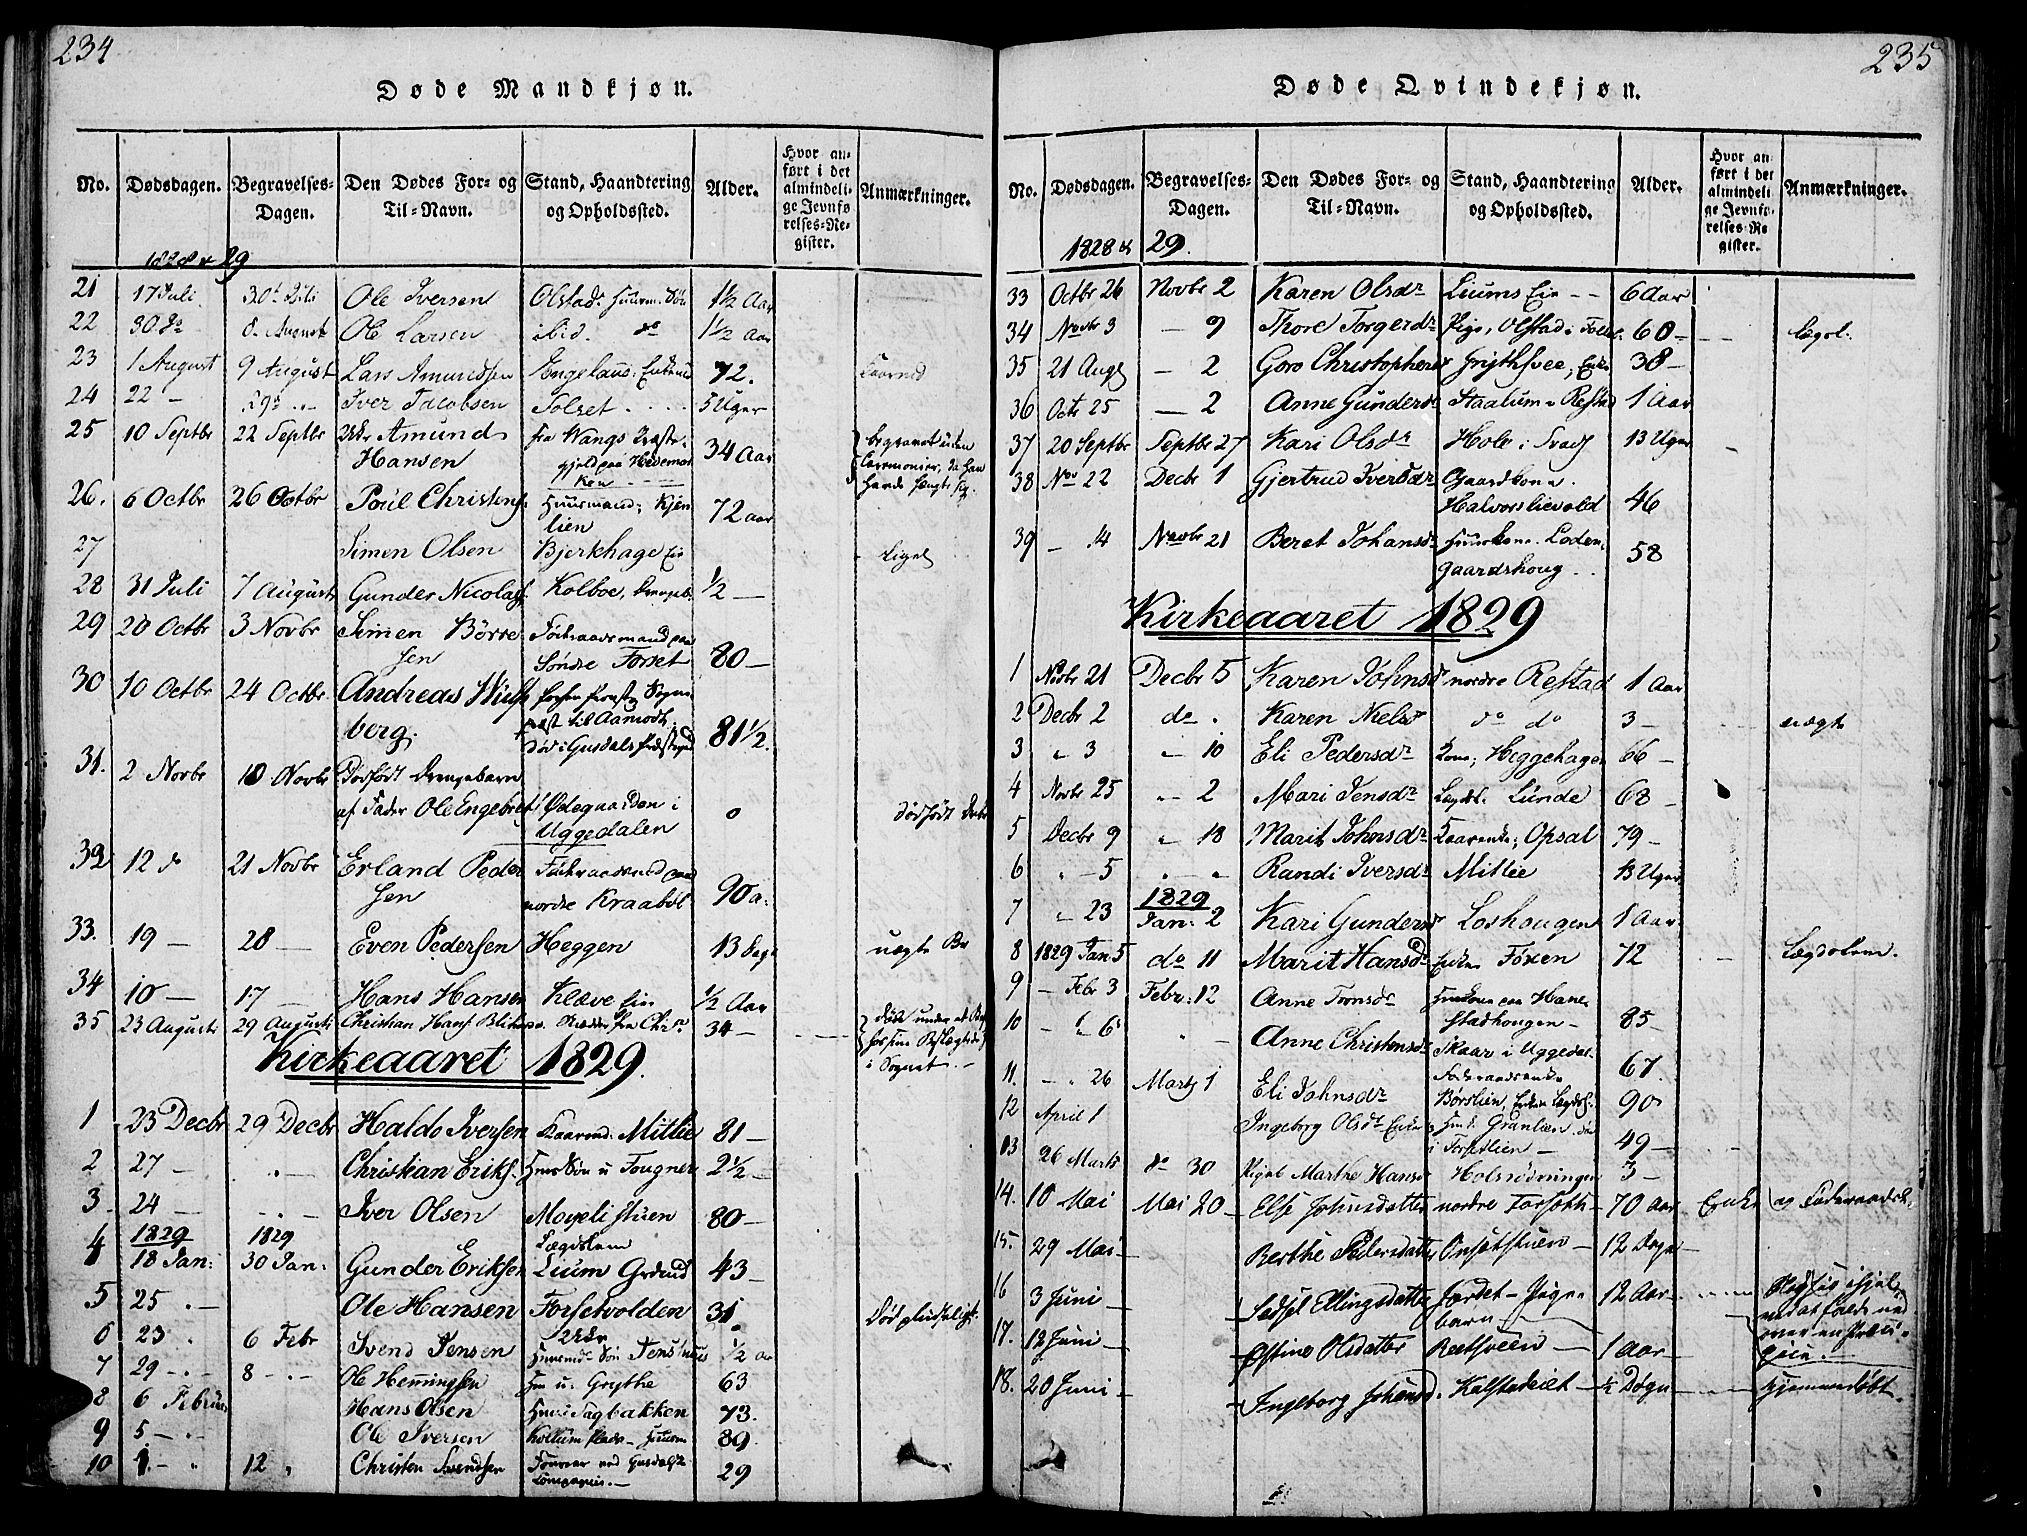 SAH, Gausdal prestekontor, Ministerialbok nr. 5, 1817-1829, s. 234-235